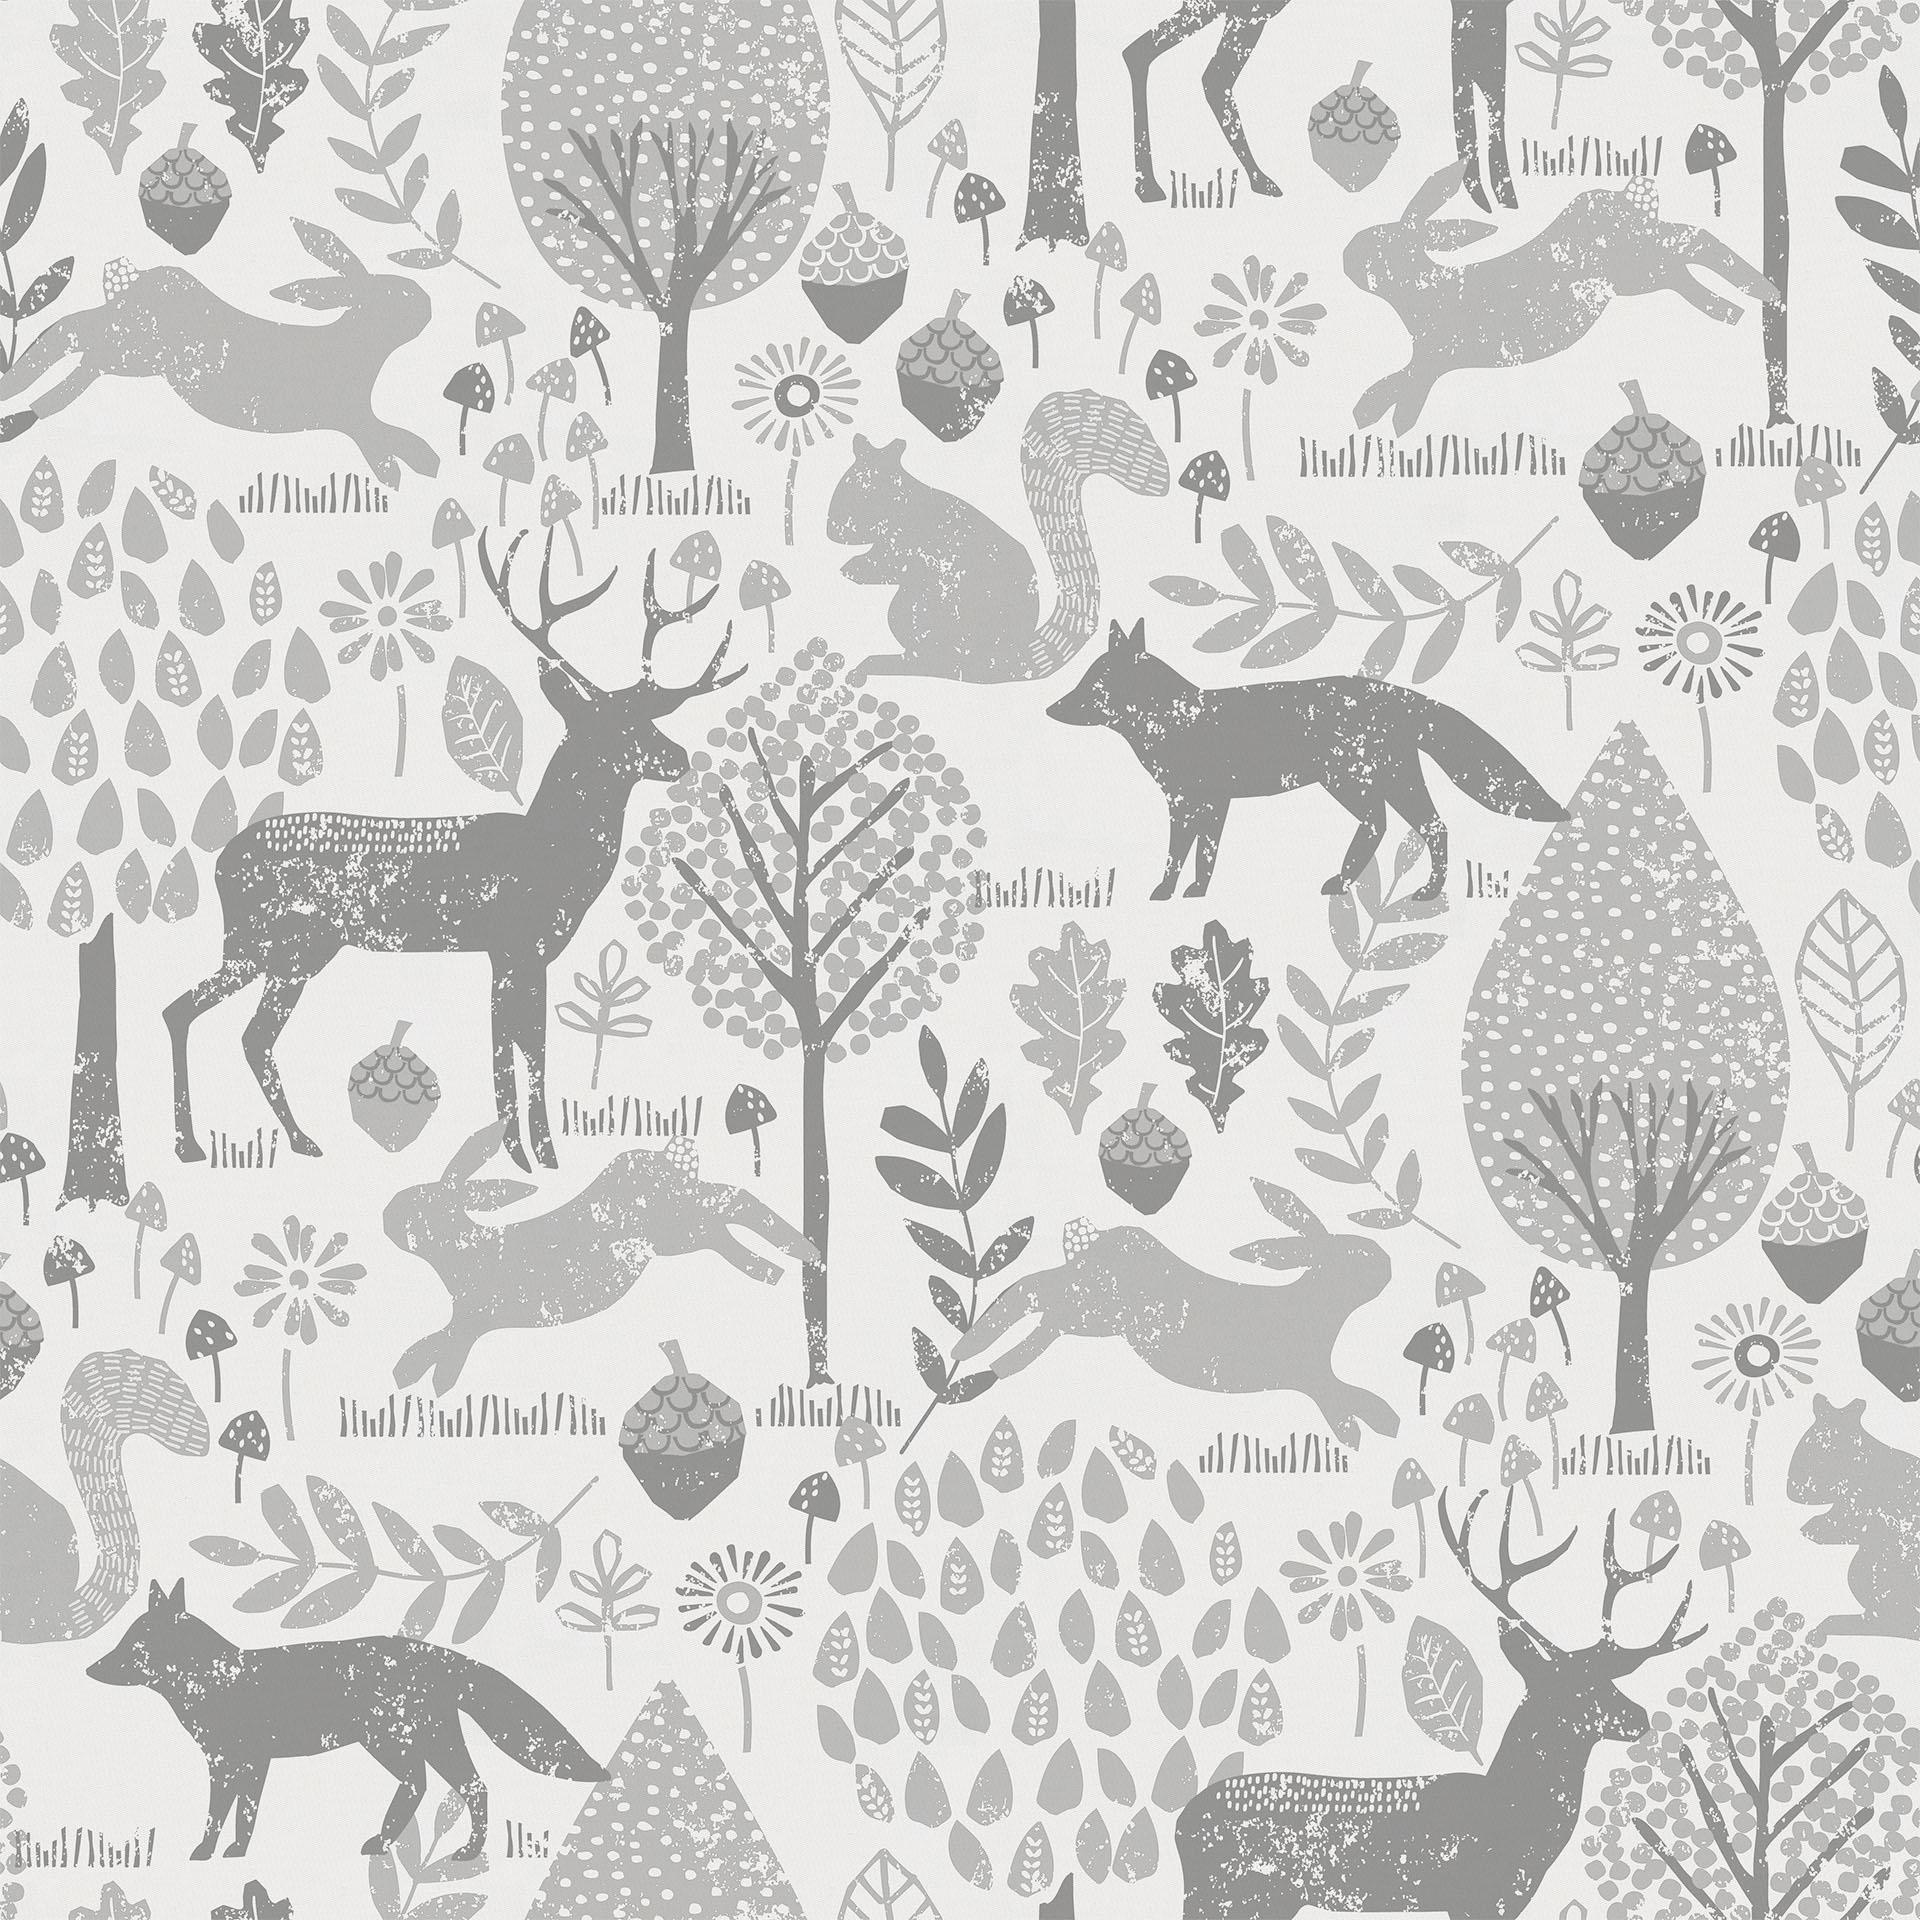 Woodland Animals Wallpaper 32 Images